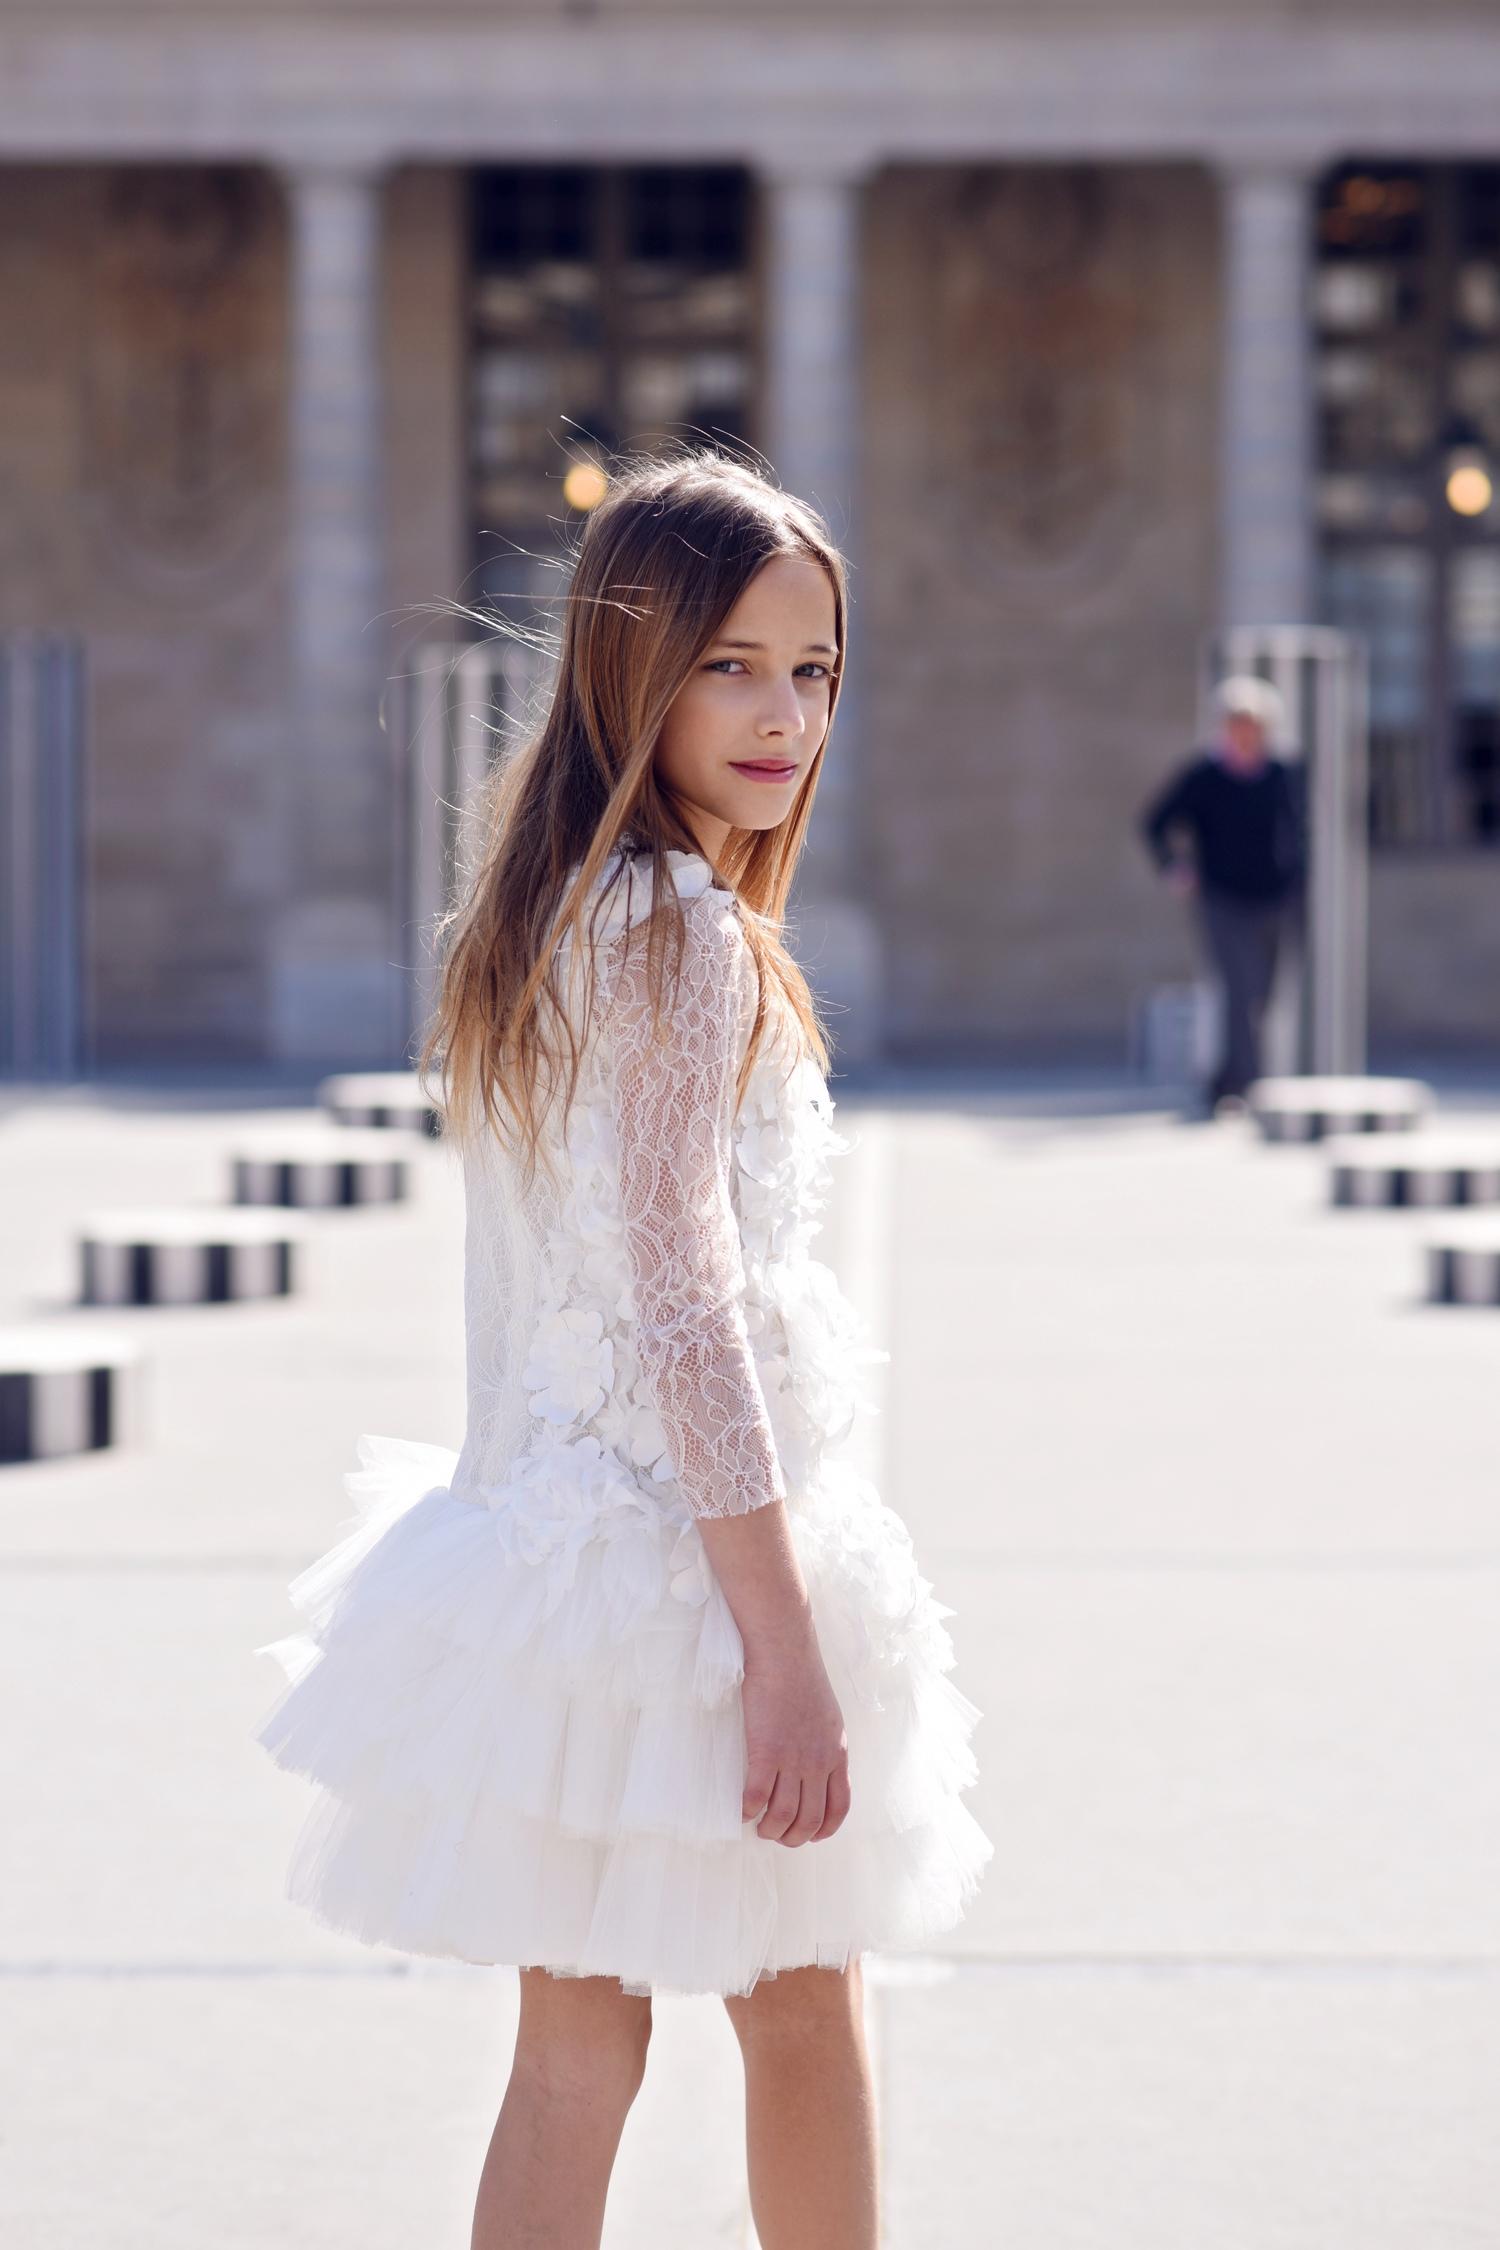 Enfant+Street+Style+by+Gina+Kim+Photography+Mischka+Aoki+Dress-1.jpeg